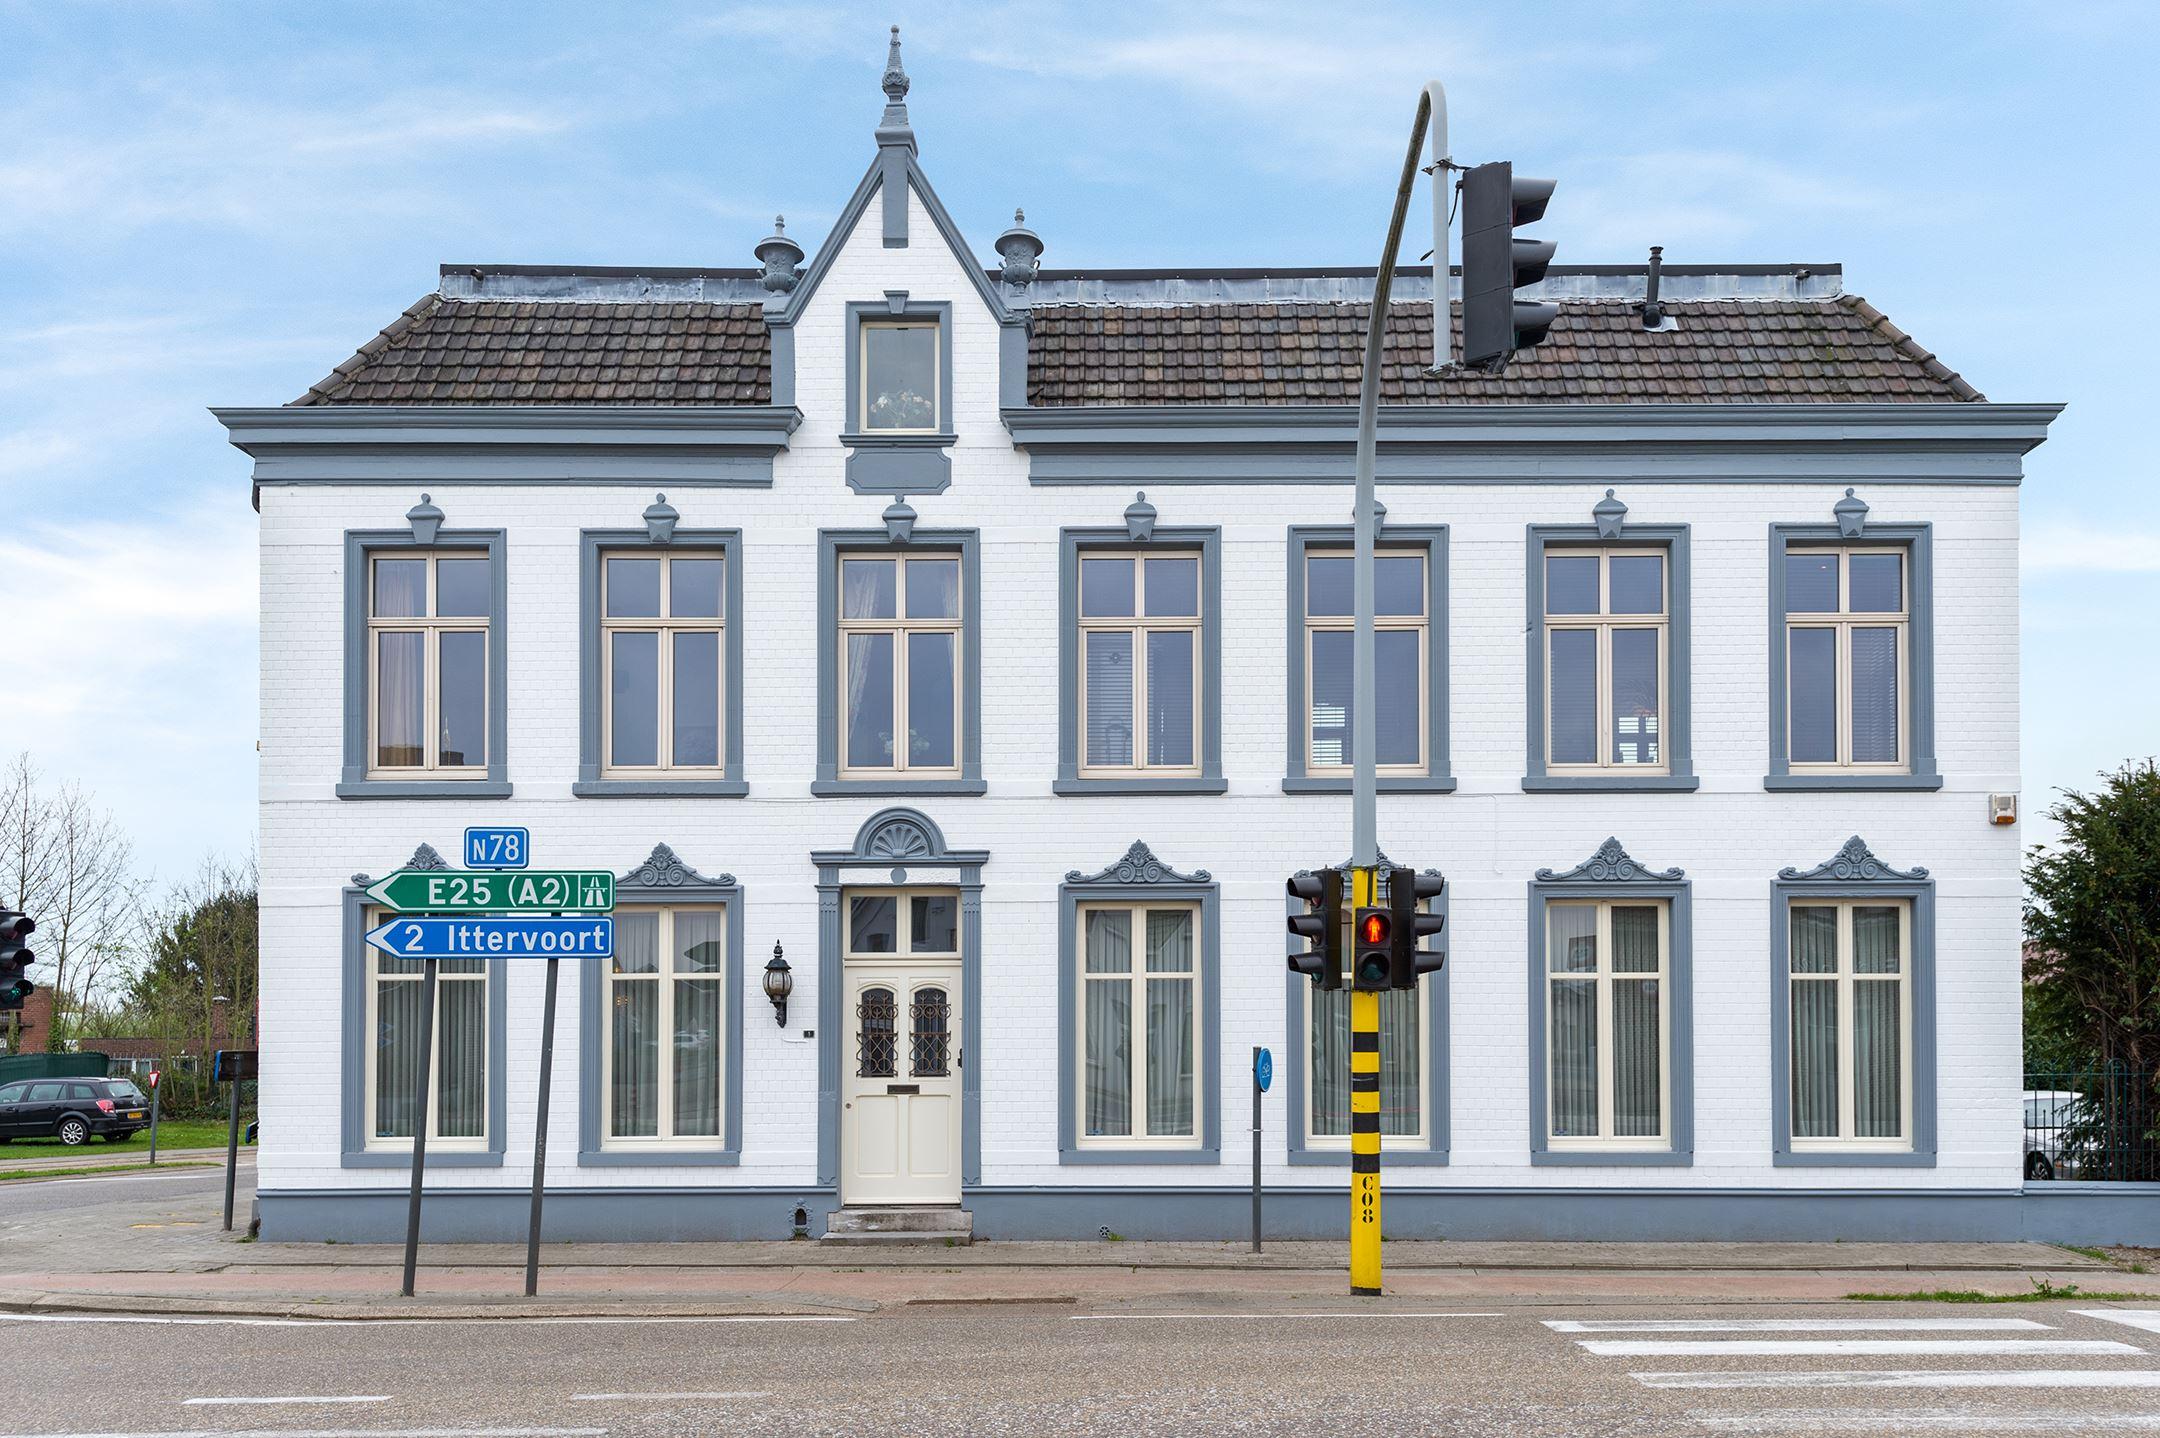 House for sale: Venlosesteenweg 316 Kessenich Belgium [funda]